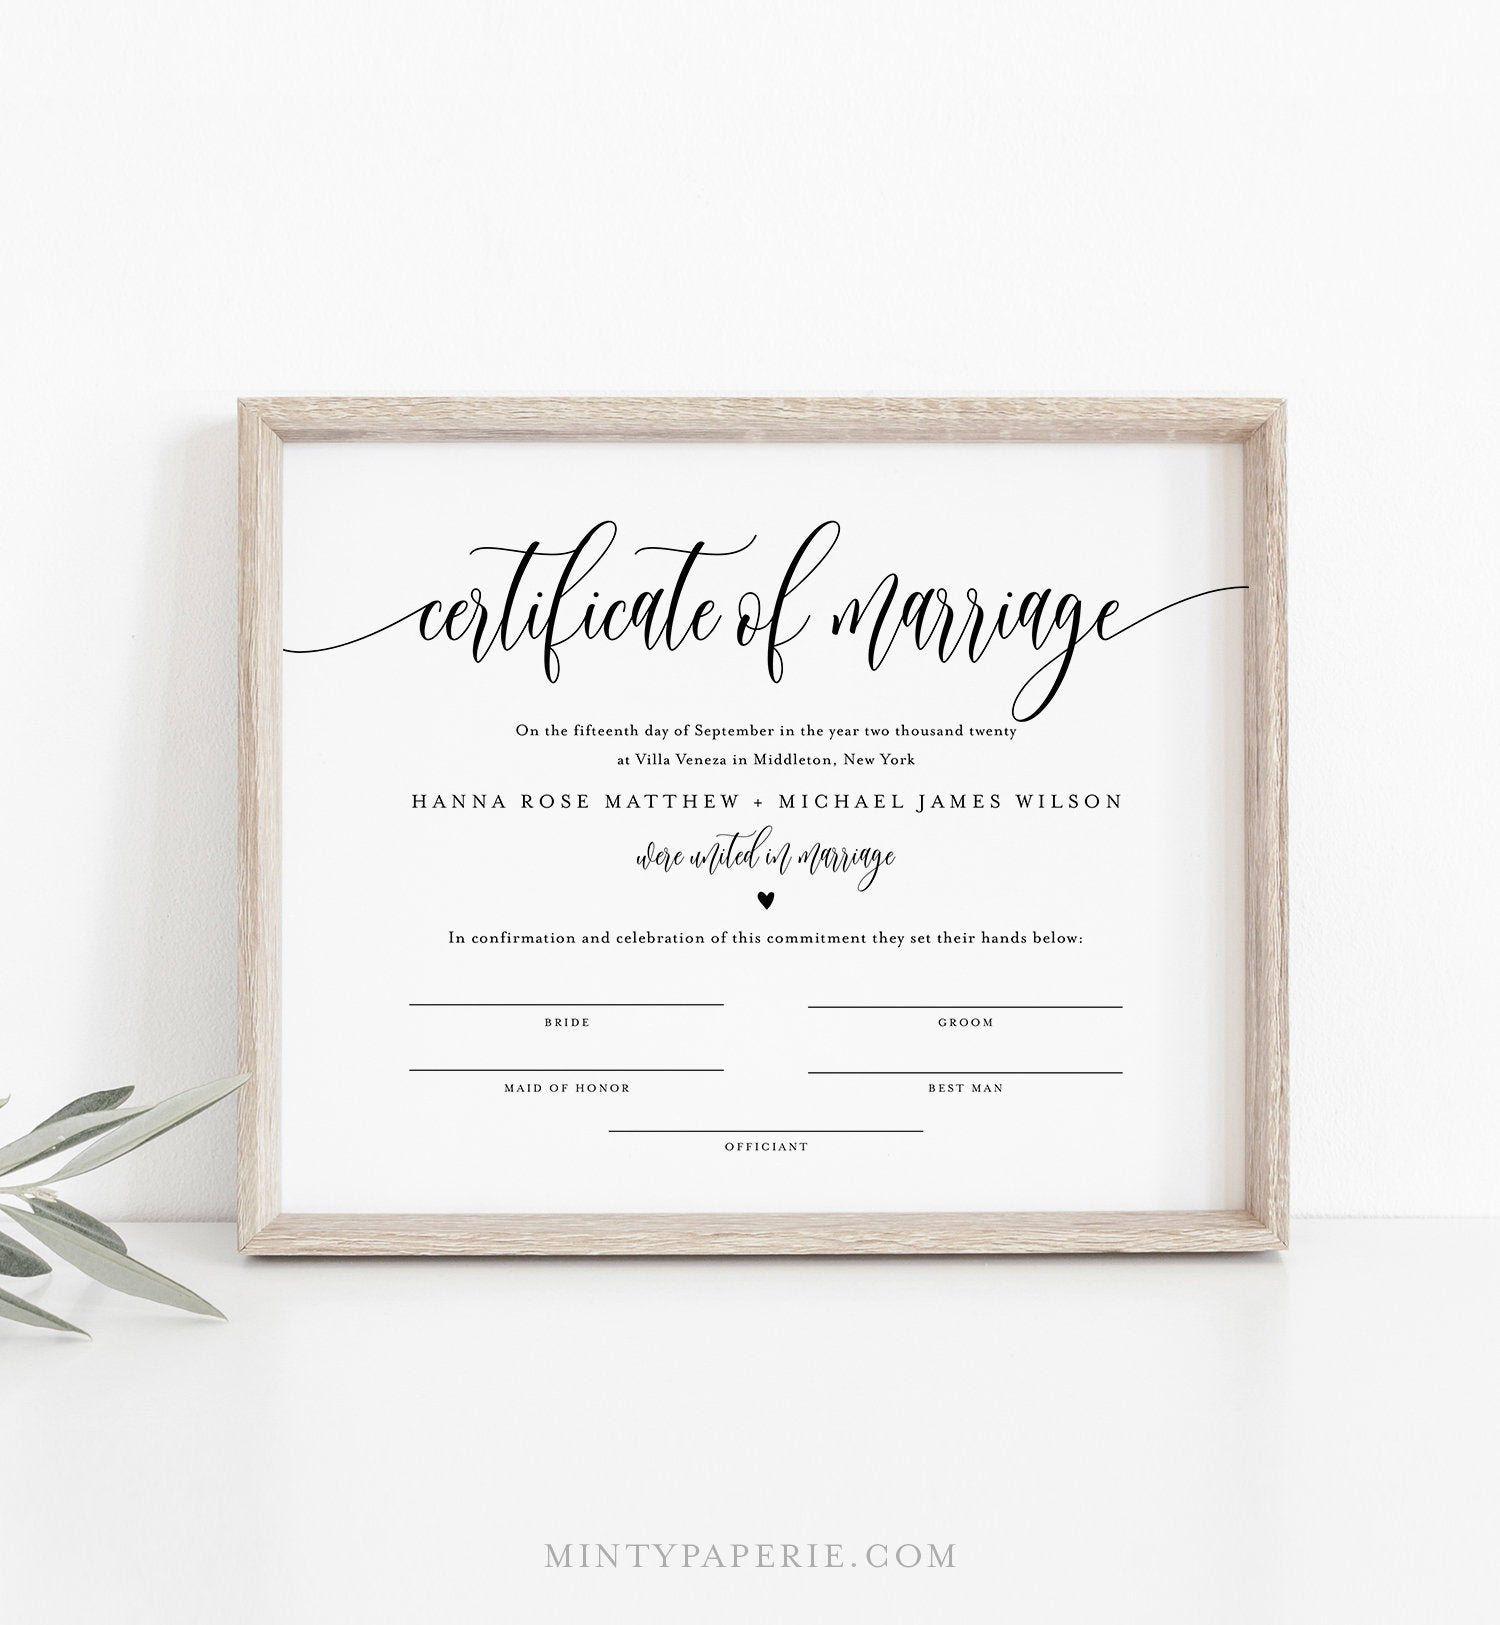 007 Stirring Certificate Of Marriage Template Sample  Word AustraliaFull